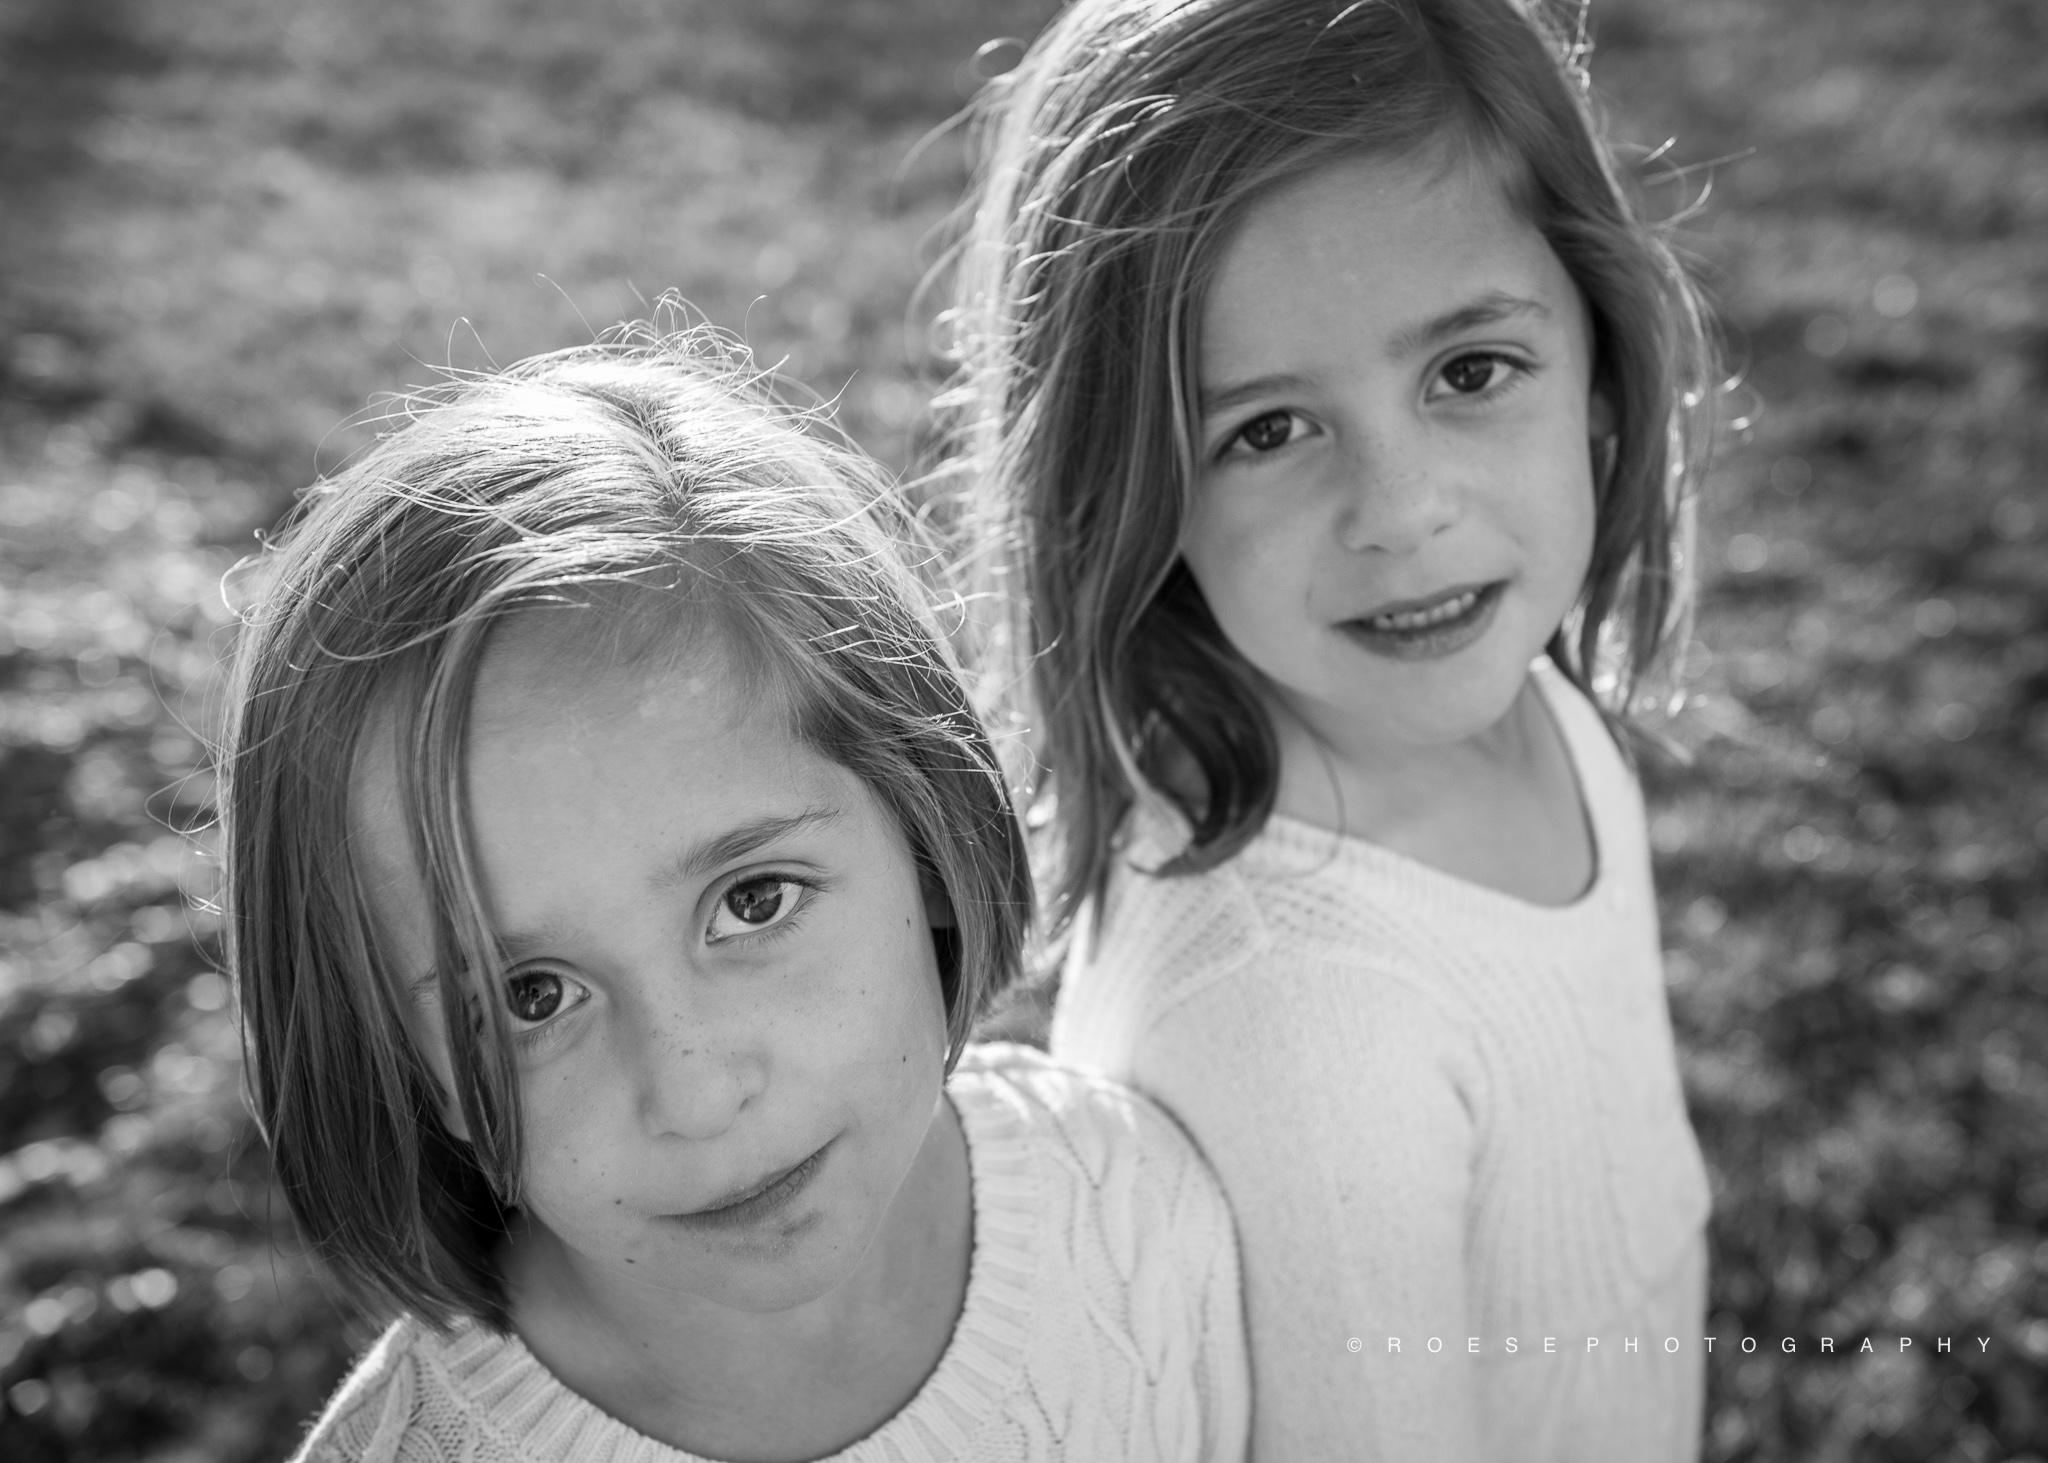 C.-Roese-Ramp-Roese-Photography-LLC_Greg-and-Renee-12.jpg